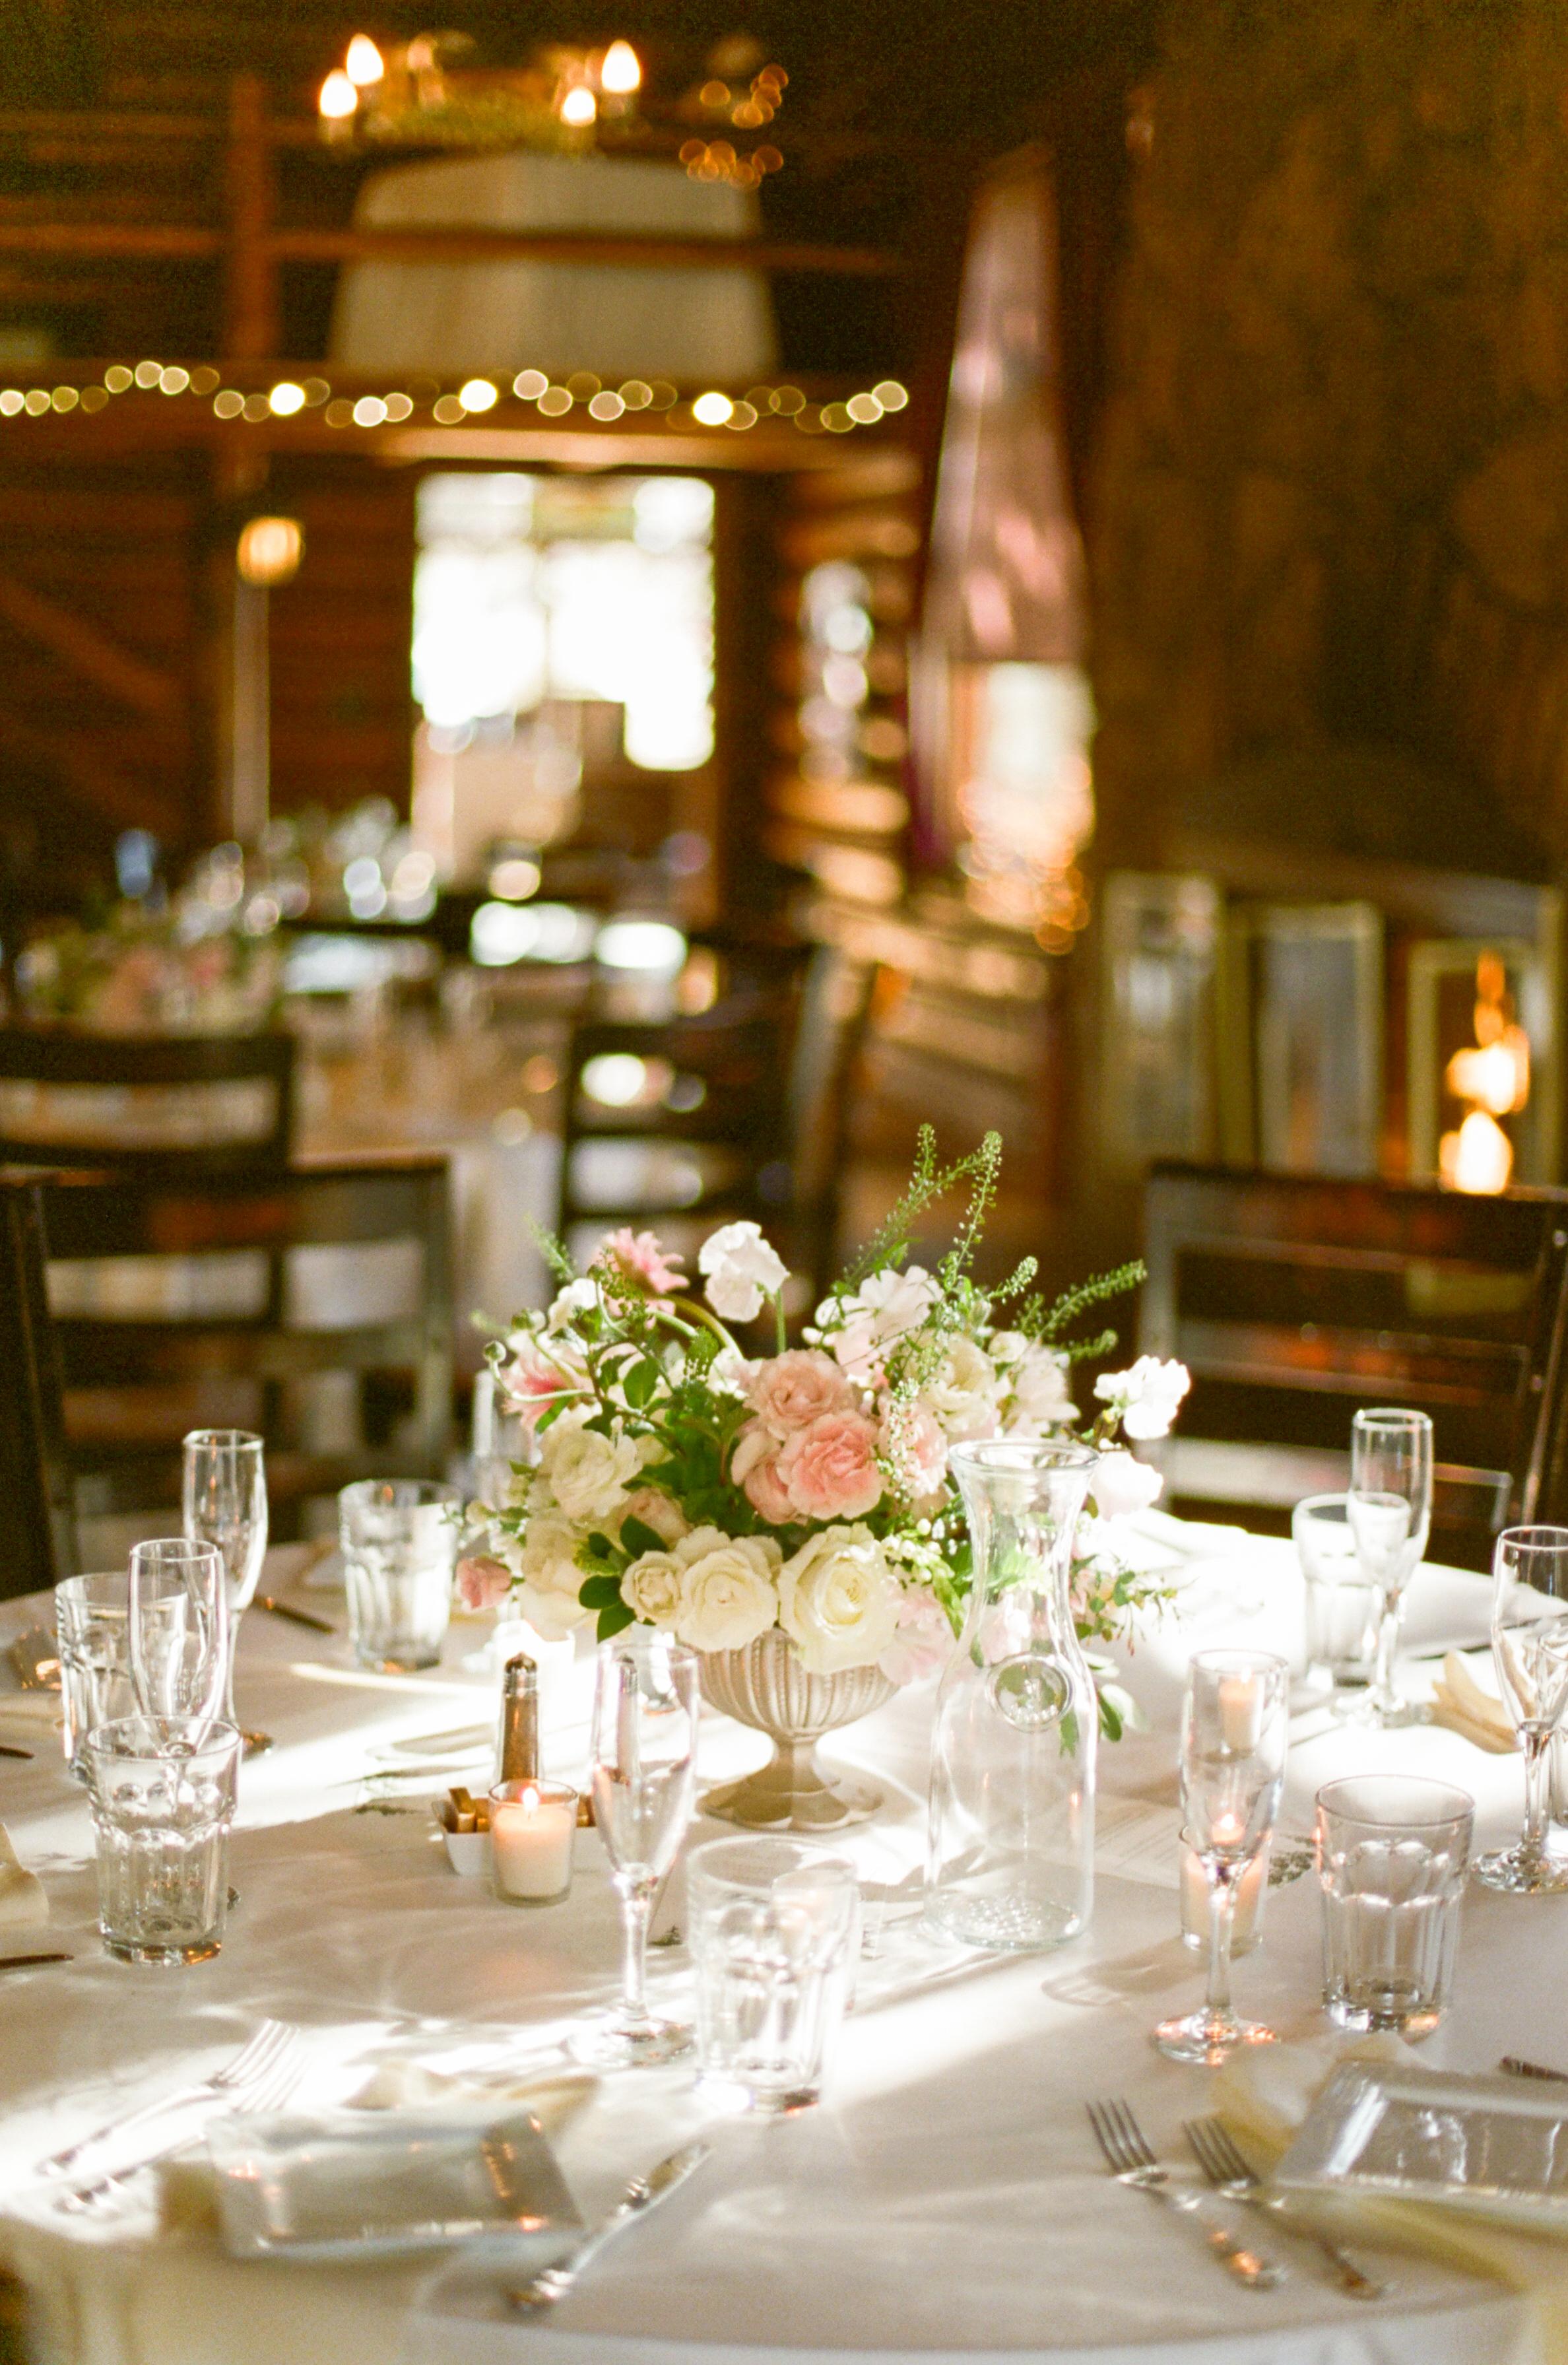 Twin_Owls_Steakhouse-wedding_photographer_Estes_Park_Lisa_ODwyer-503.jpg